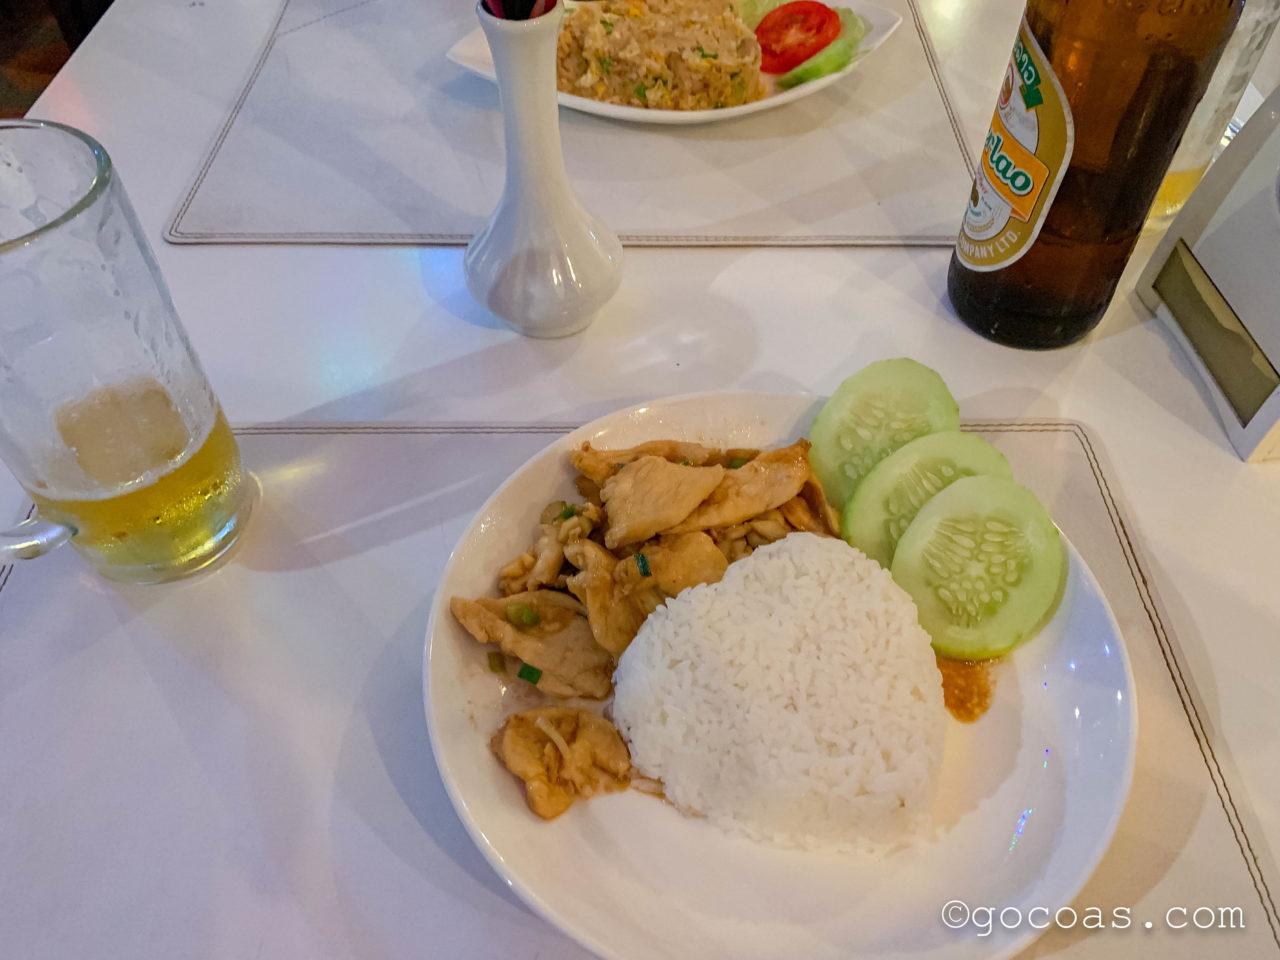 Garden Restaurantの鳥の炒め物とライス